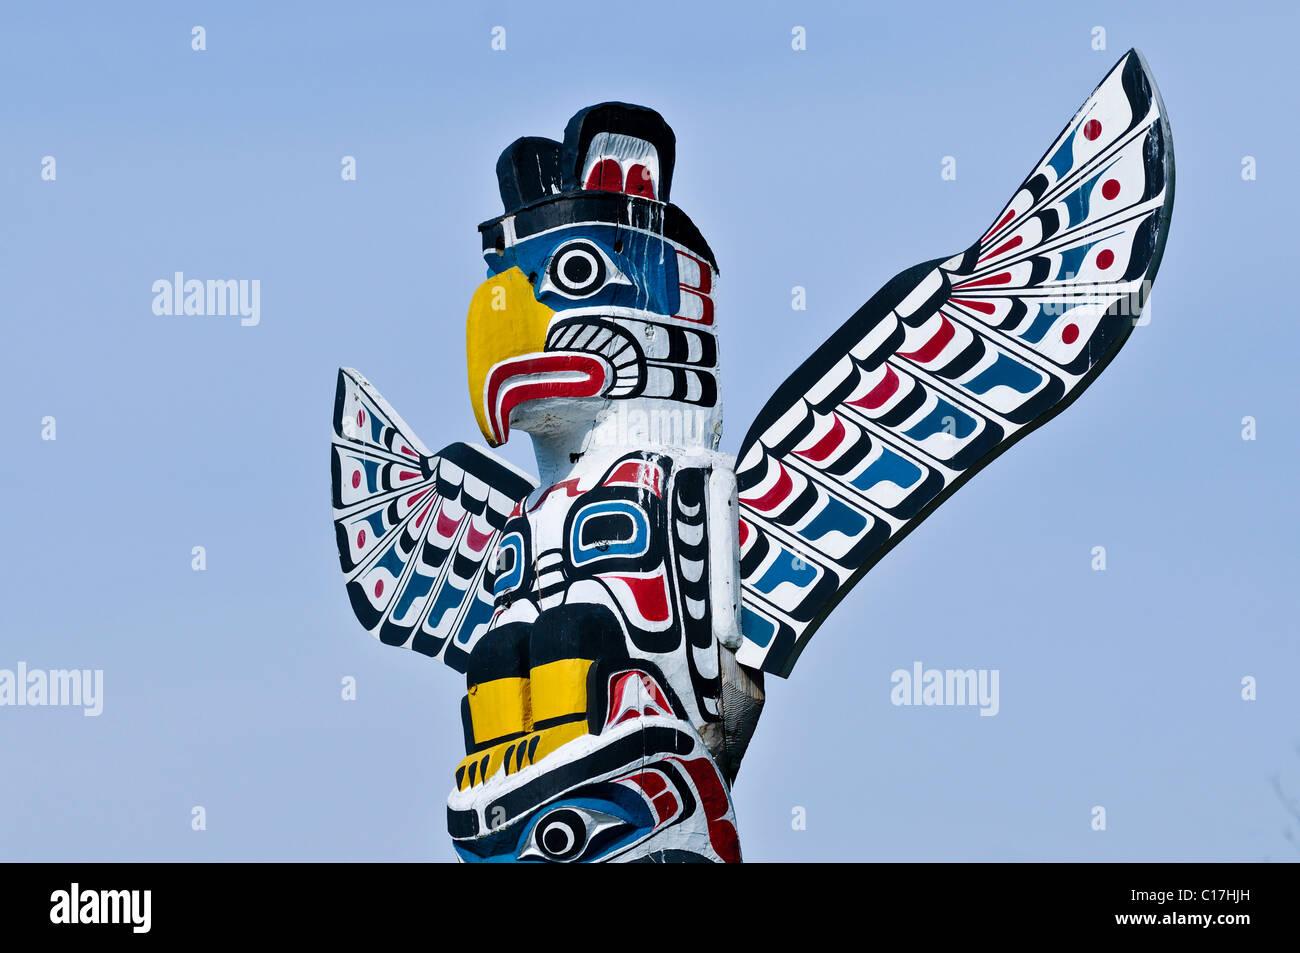 Totem indiani, totem pole di Stanley Park, Vancouver, British Columbia, Canada, America del Nord Immagini Stock